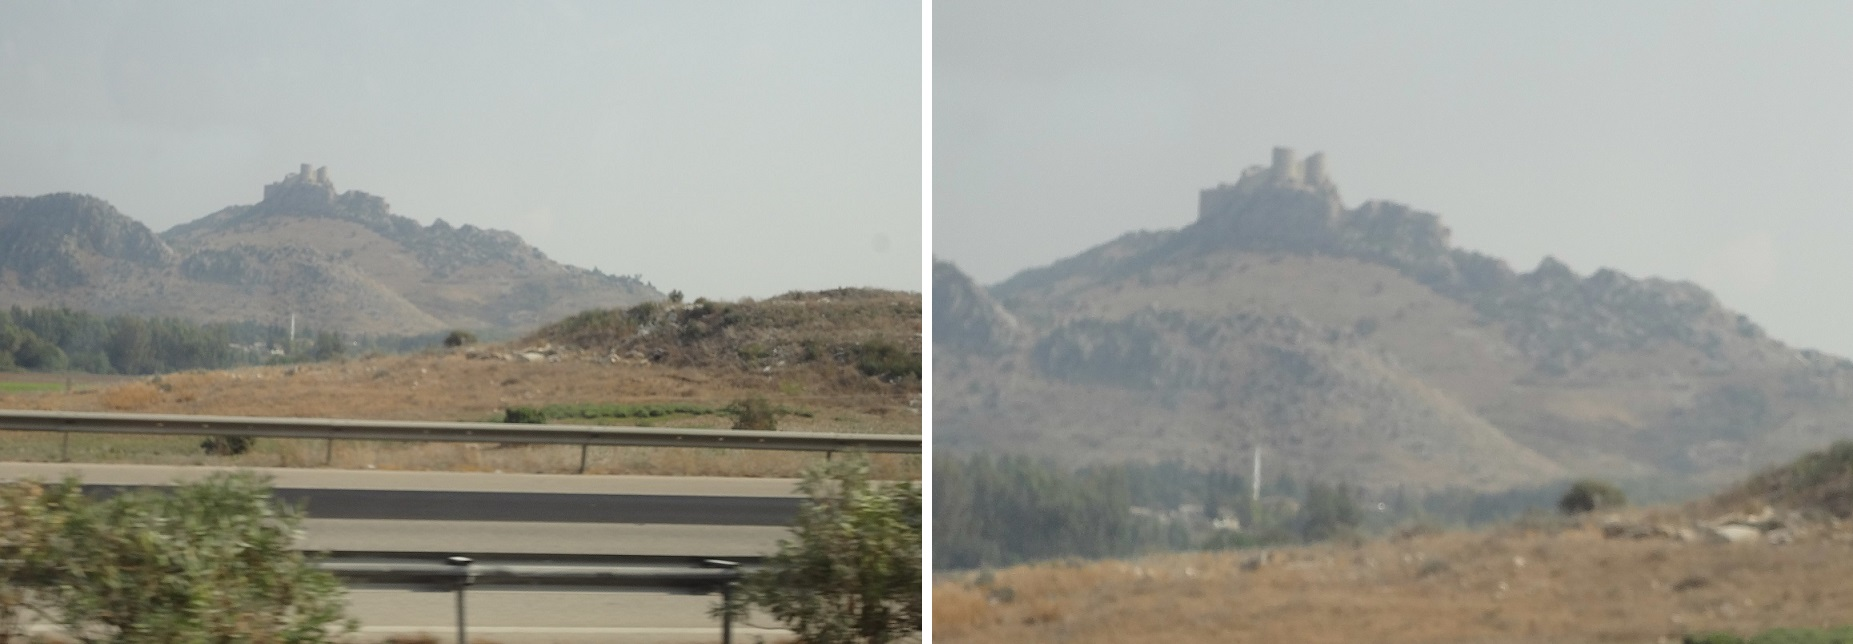 Yılankale, Adana Province Turkey  weepingredorger